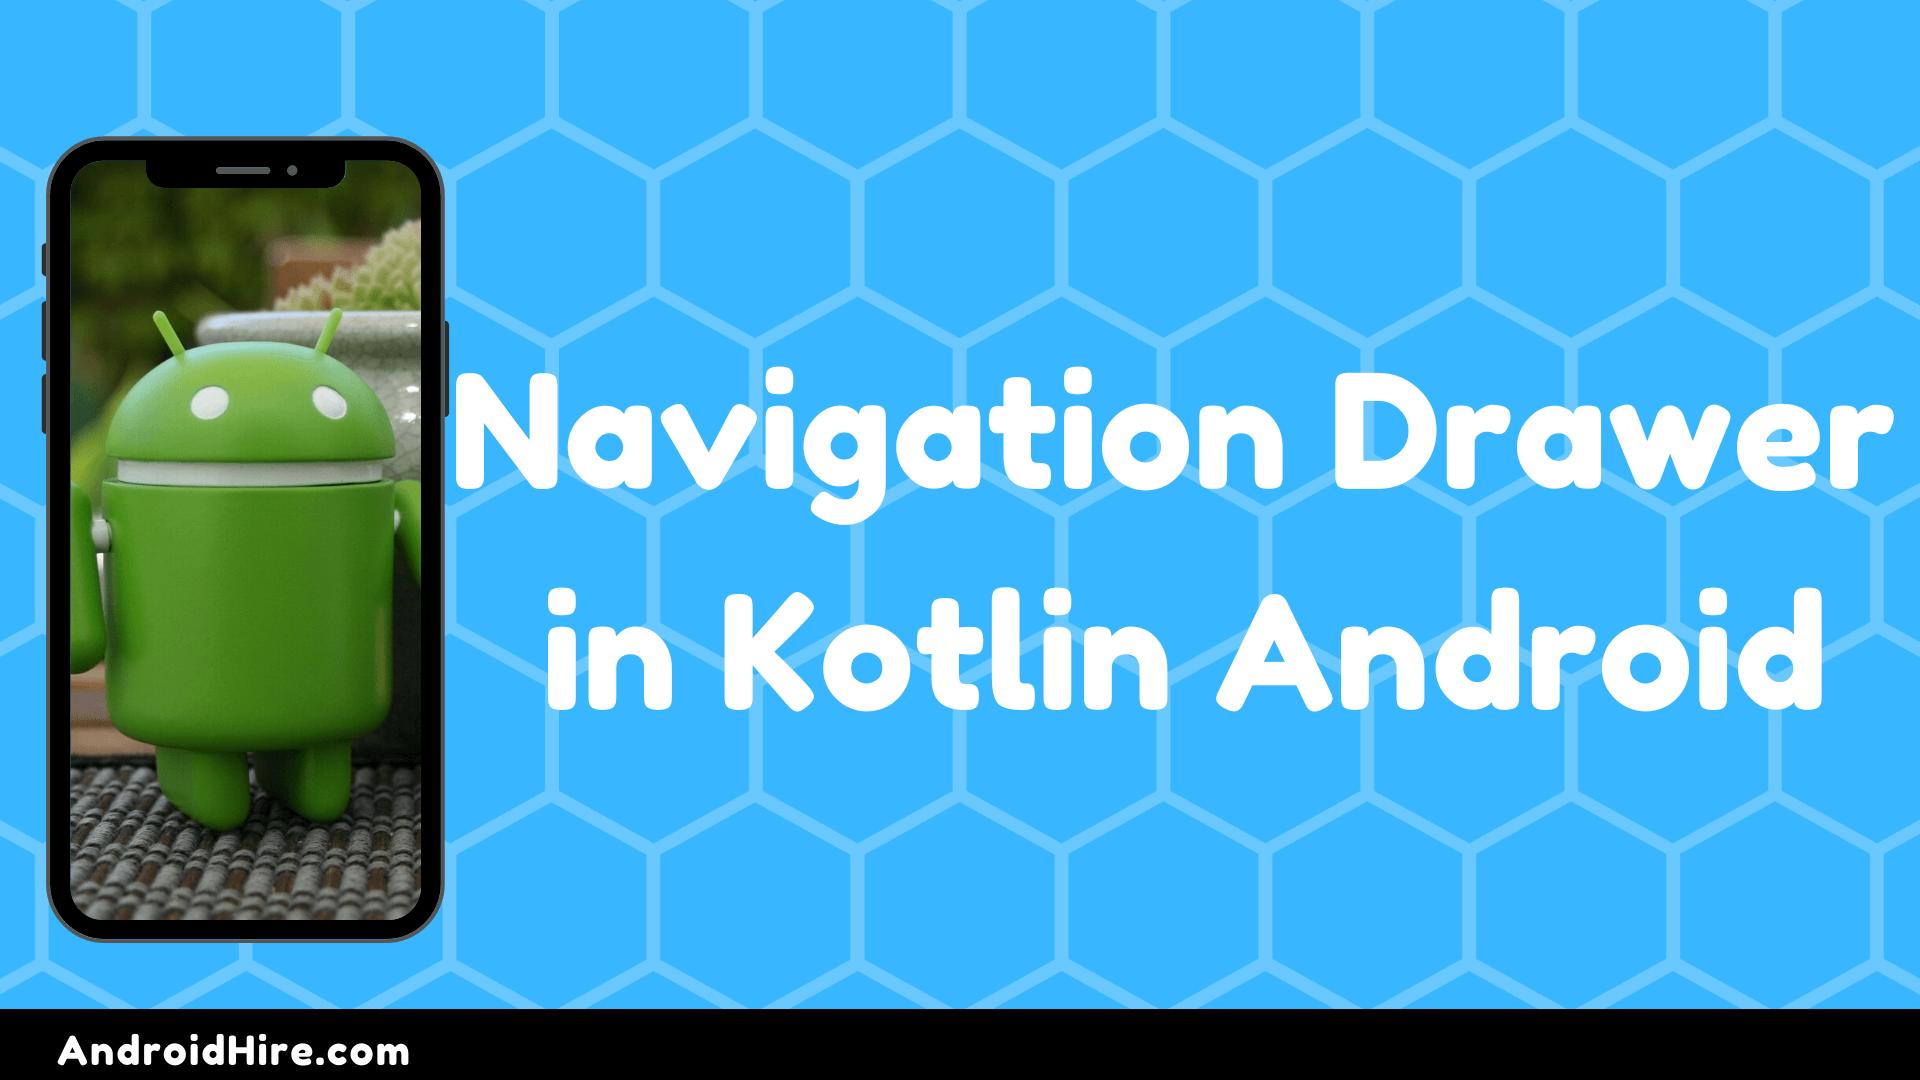 Navigation Drawer in Kotlin Android